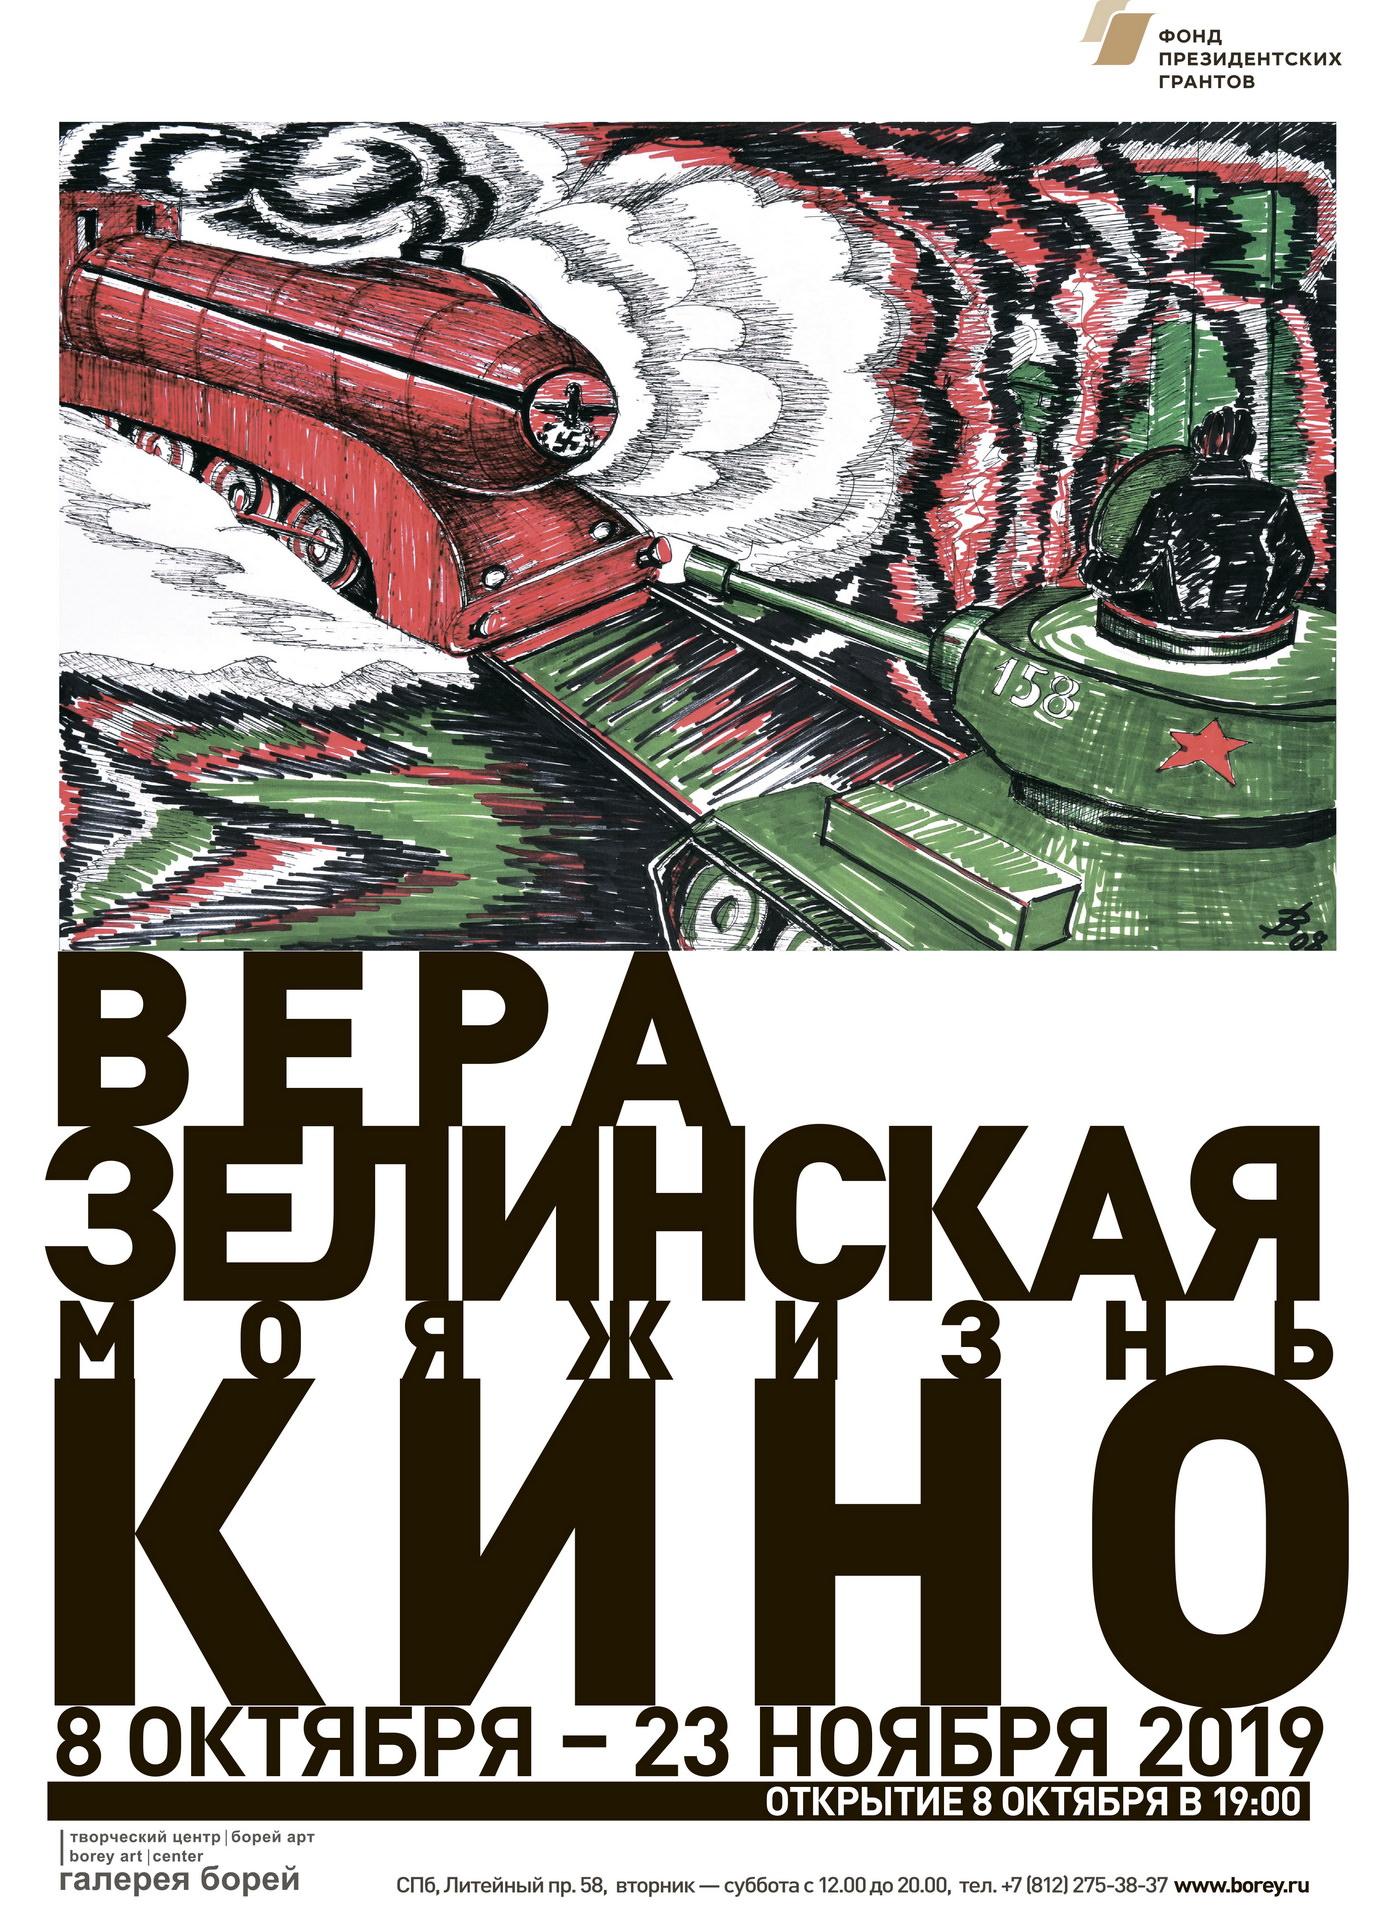 Vera Zelinskaya. MY LIFE IS A MOVIE